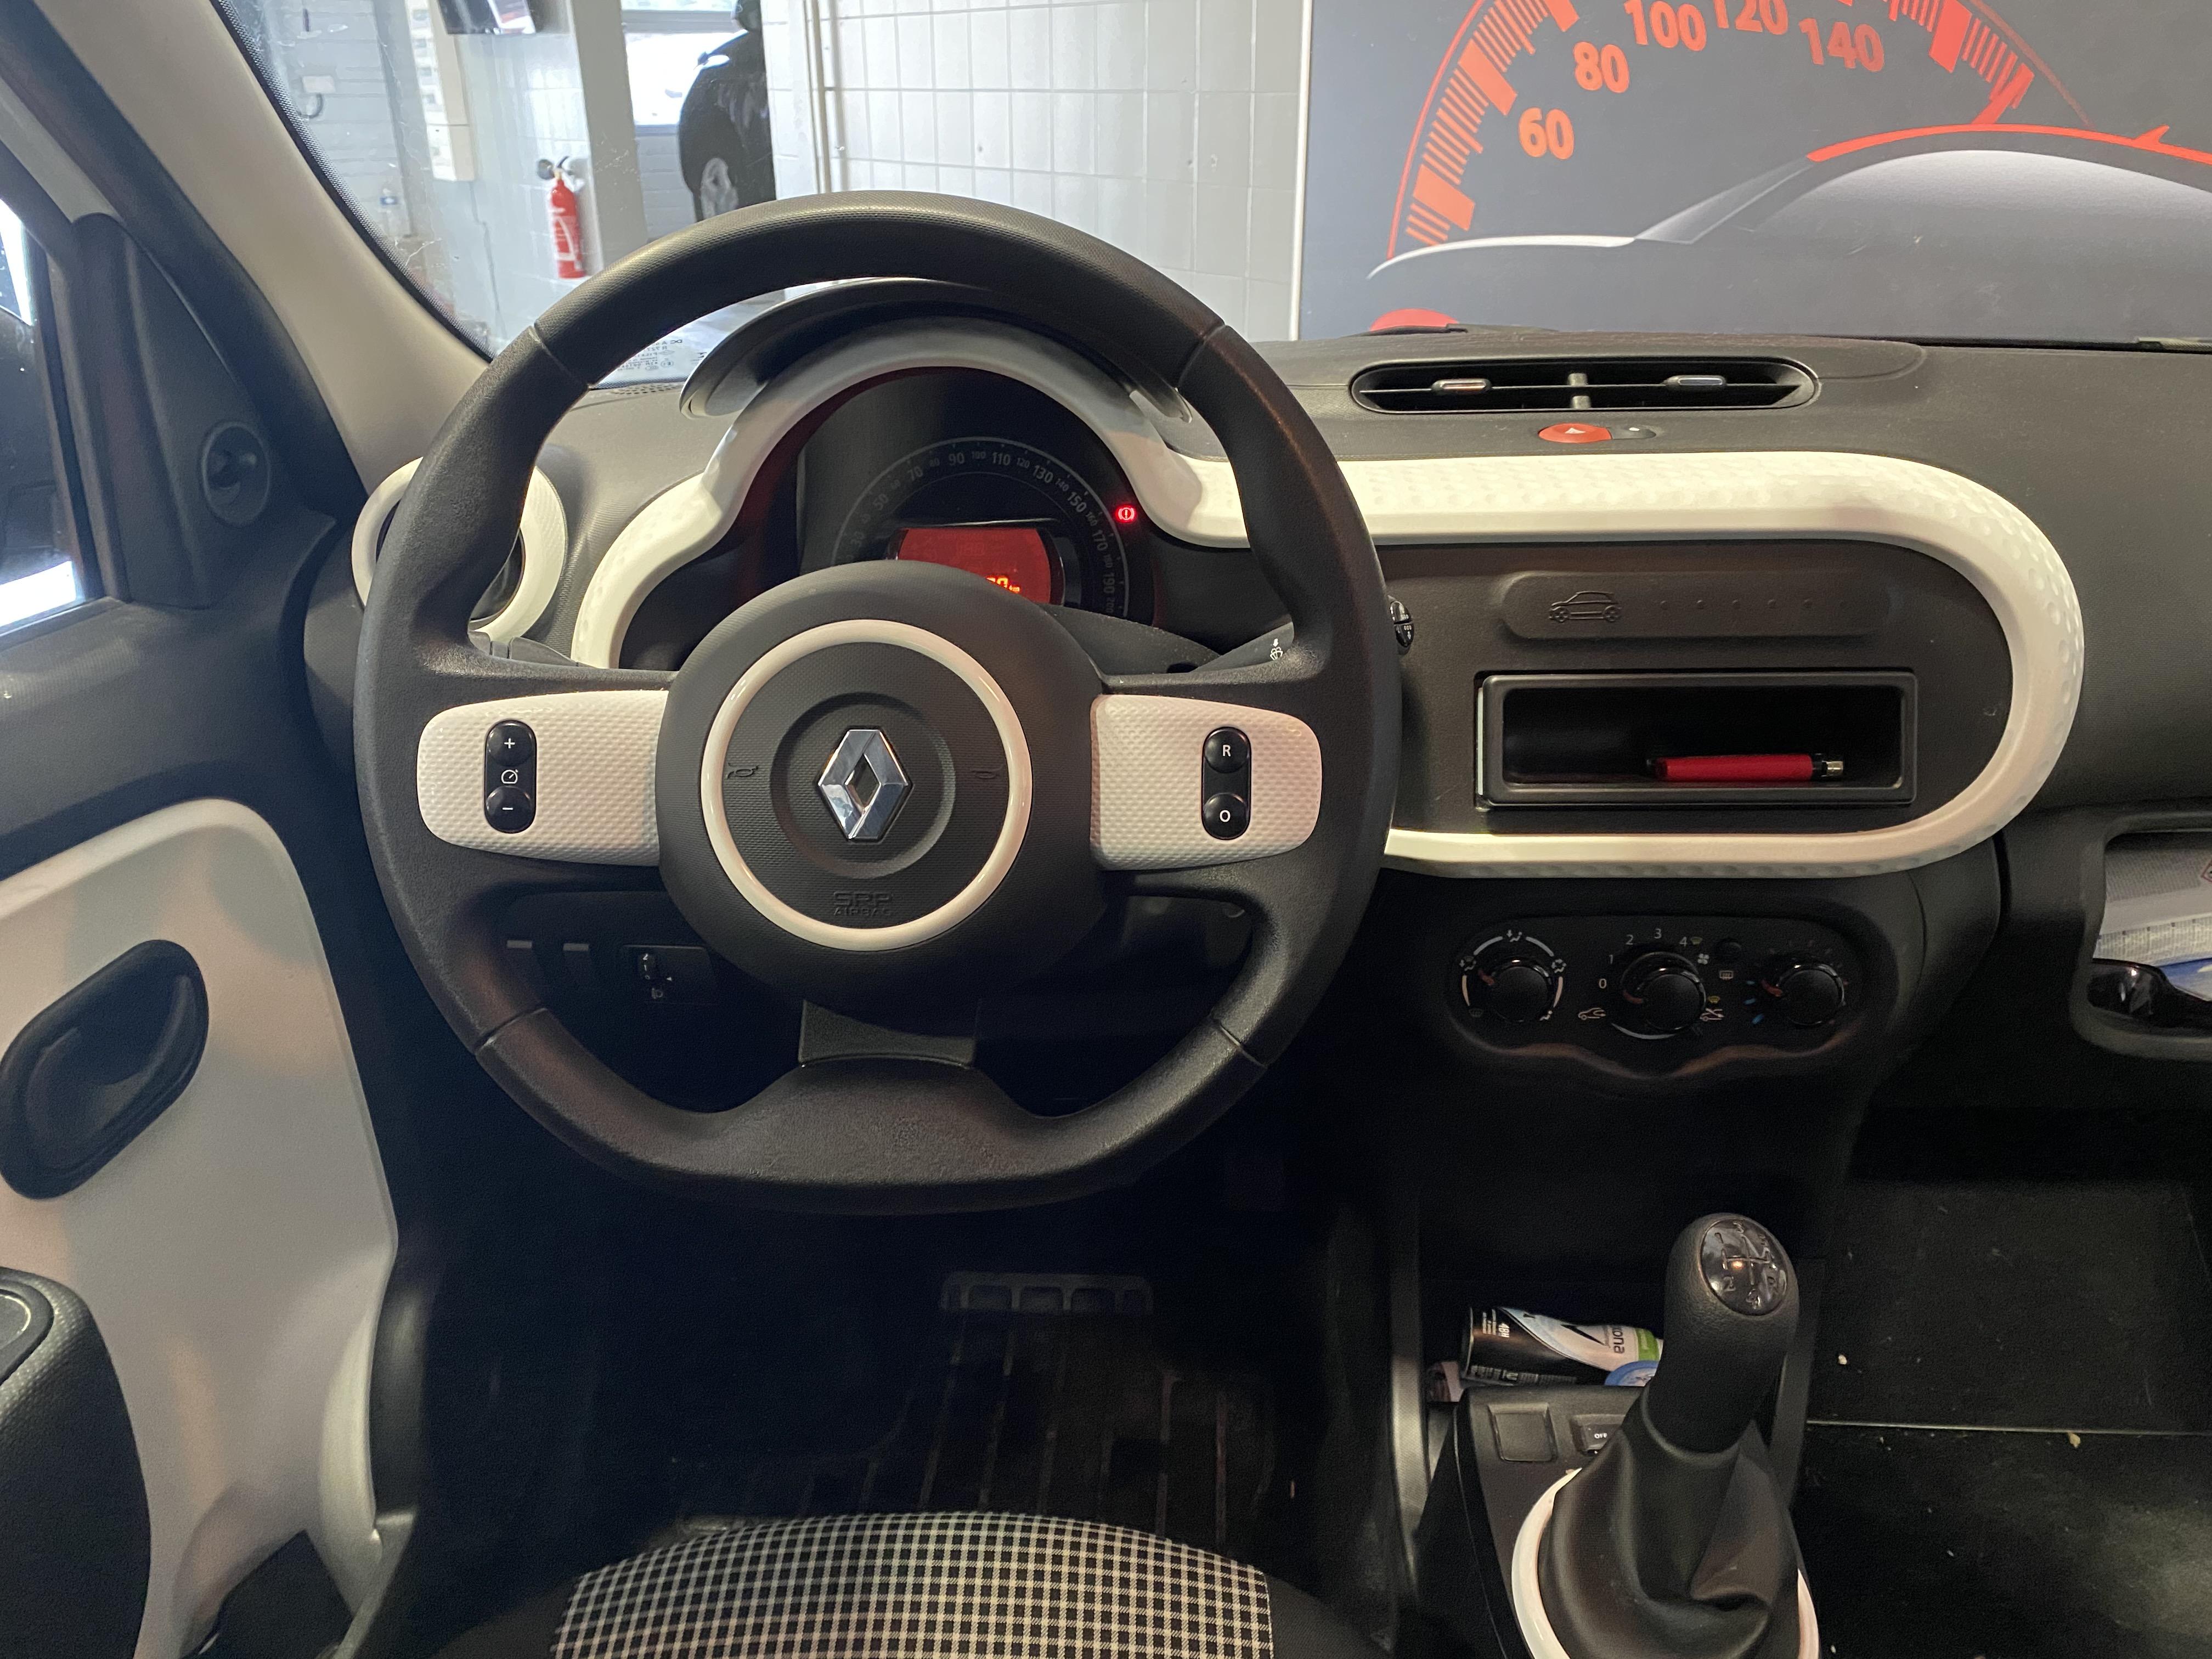 photo_Renault Twingo III 1.0 71 CH - GARANTIE 6 MOIS,